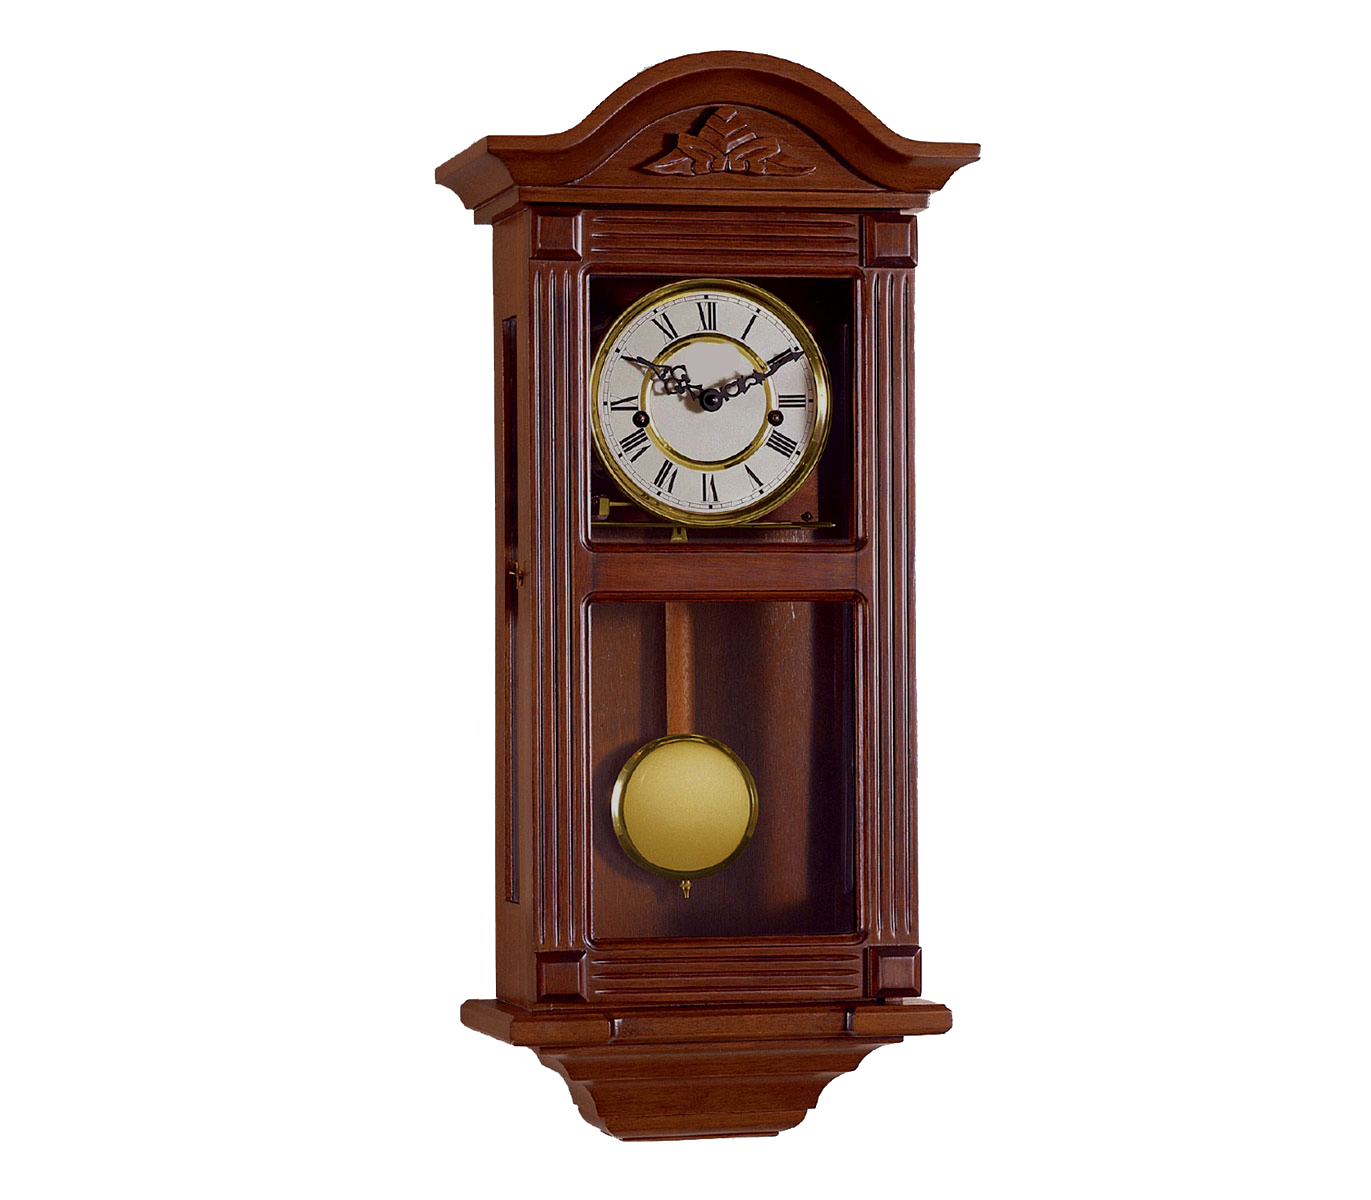 Reloj de pendulo de pared reloj con carrillon maquinaria - Relojes modernos de pared ...